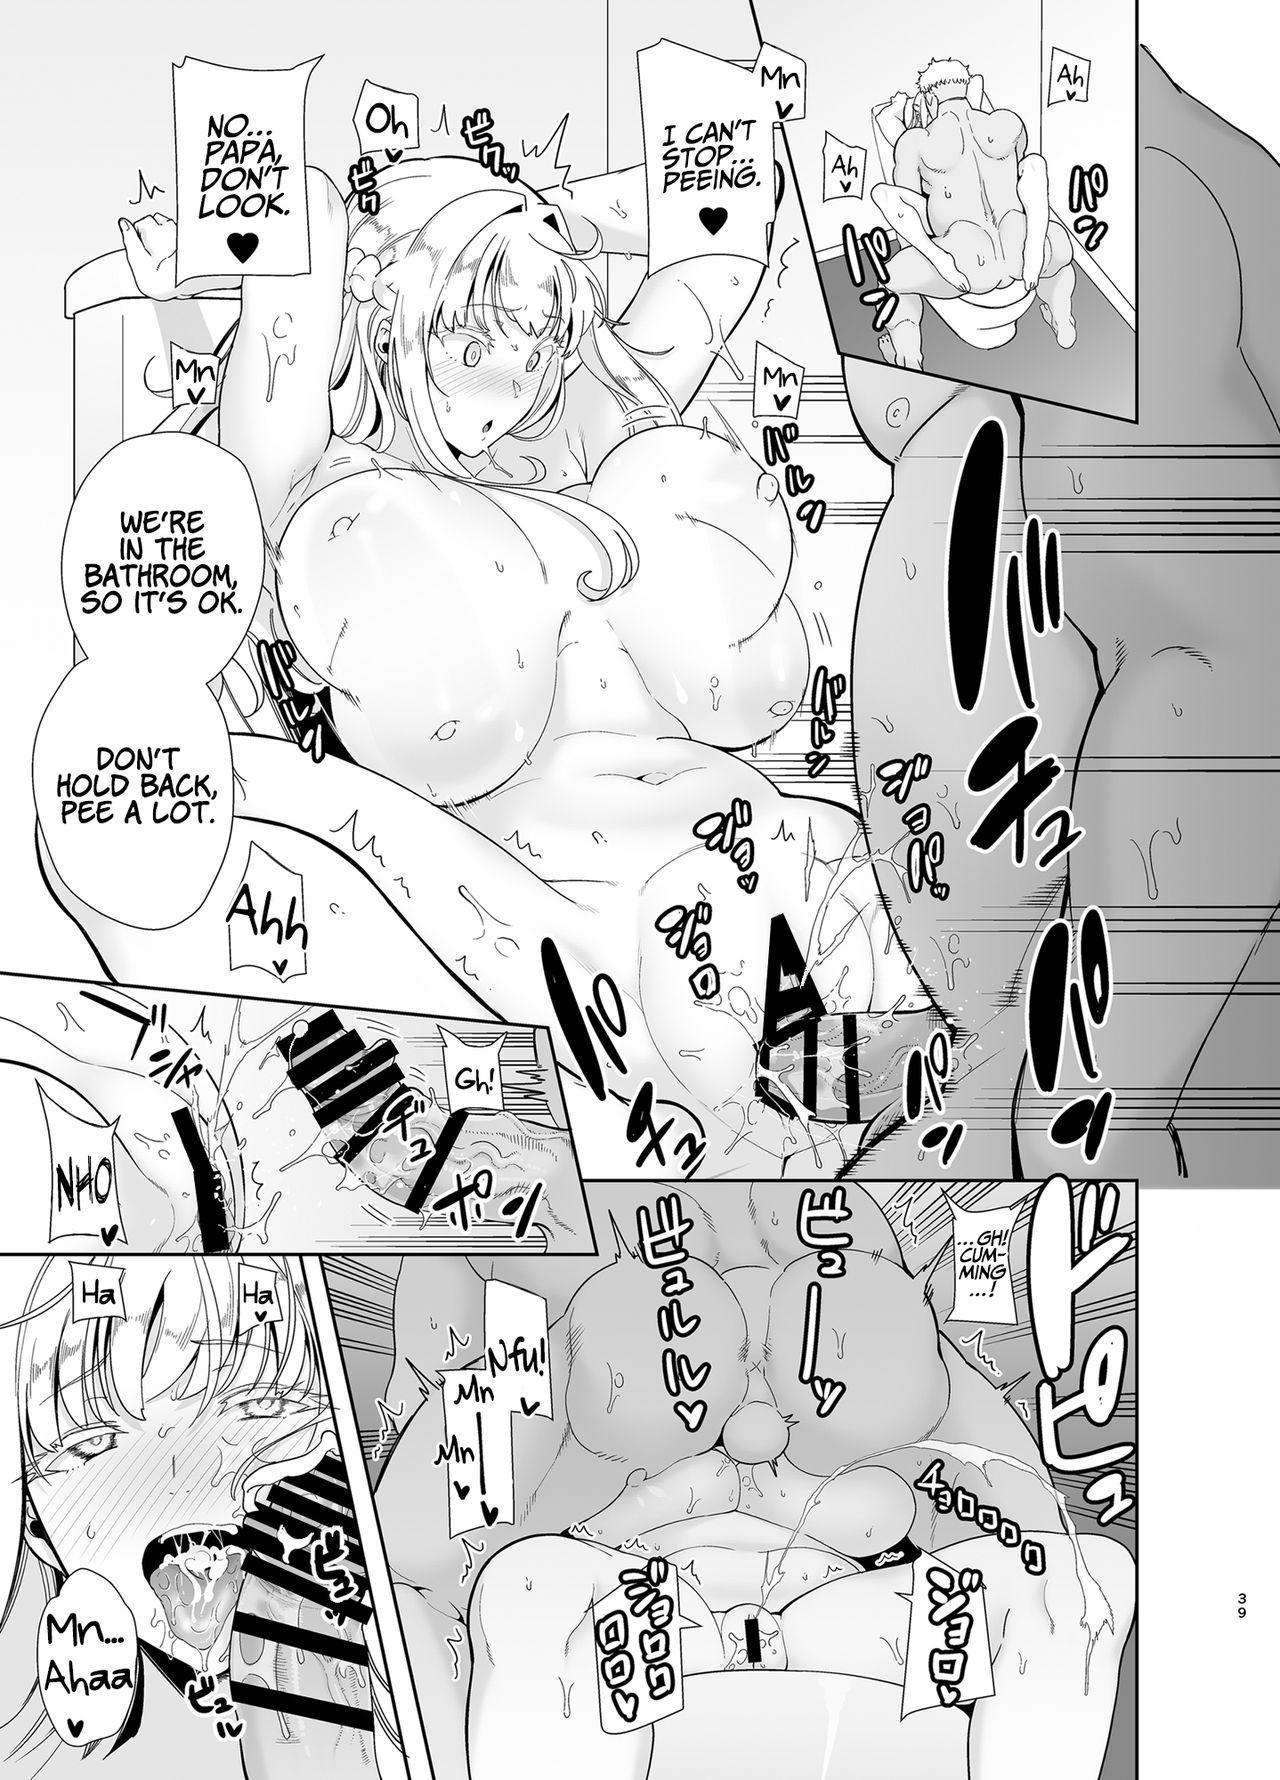 [DOLL PLAY (Kurosu Gatari)] Seika Jogakuin Koutoubu Kounin Sao Oji-san 4 | Seika Girls' Academy High School's Official Rod Oji-san 4 [English] [Coffedrug] [Digital] 37